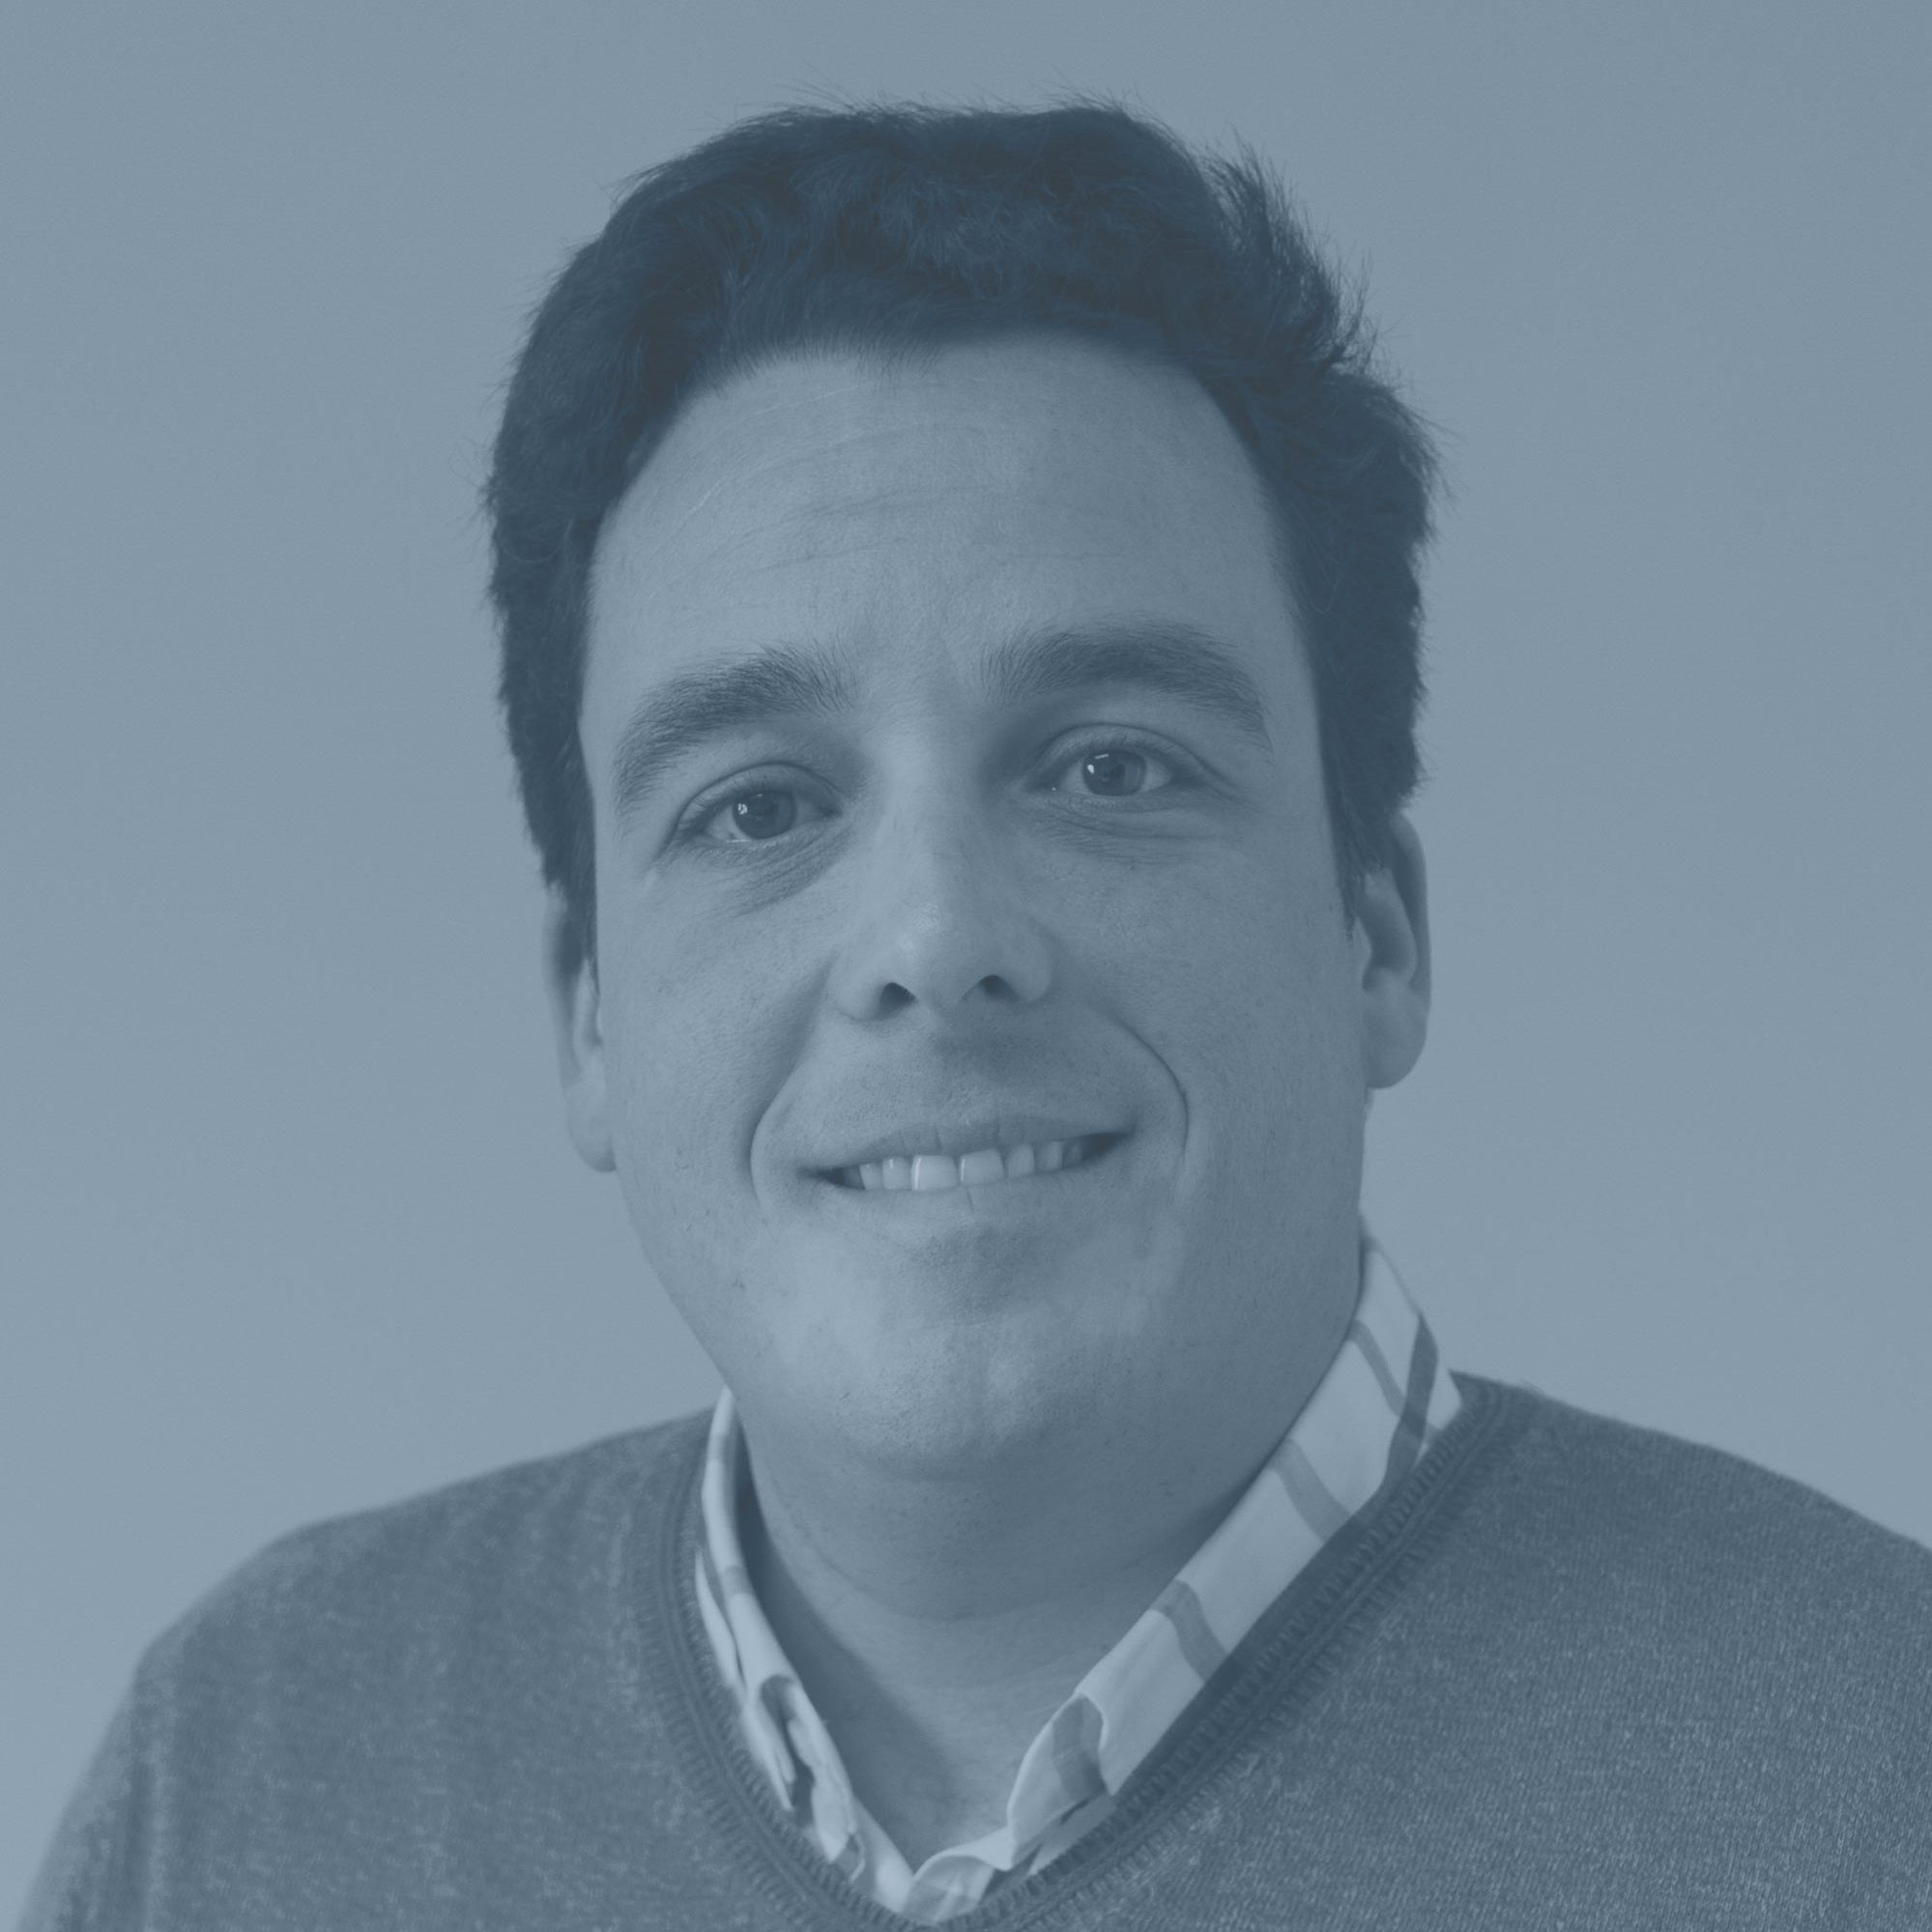 Antonio Jiménez Bustamante